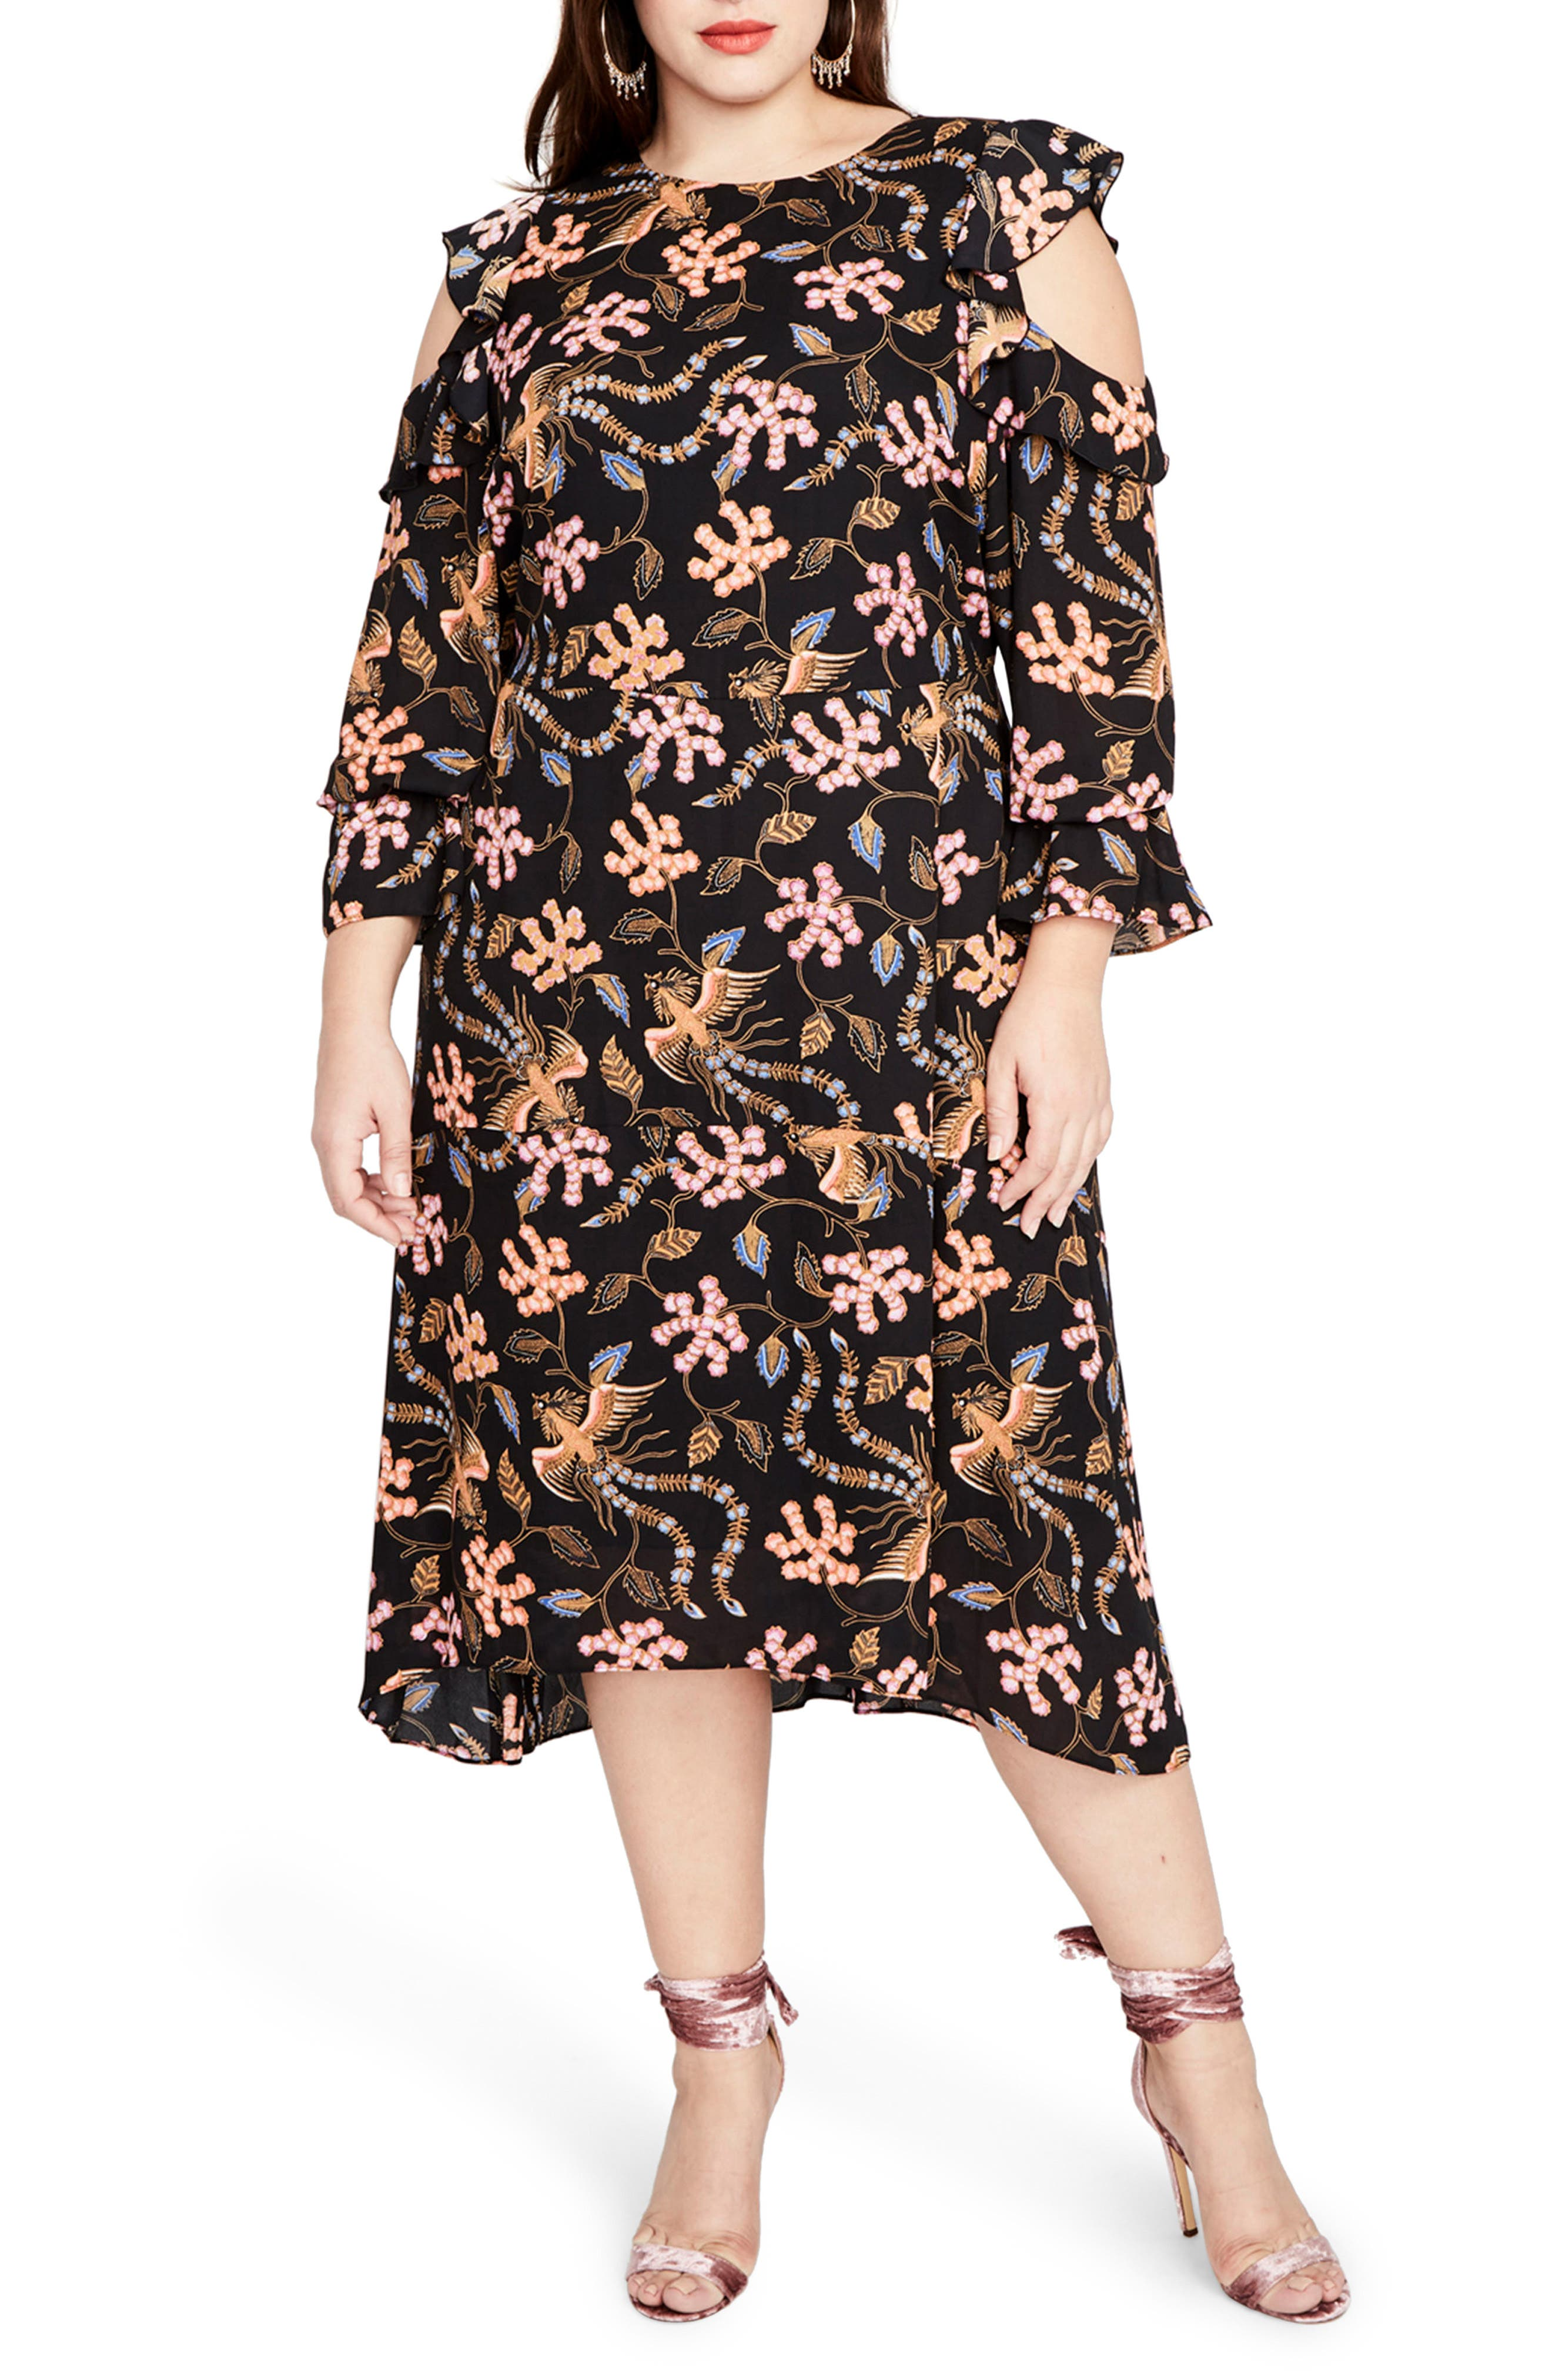 RACHEL BY Rachel Roy Cold Shoulder Ruffle Midi Dress,                         Main,                         color, Black Multi